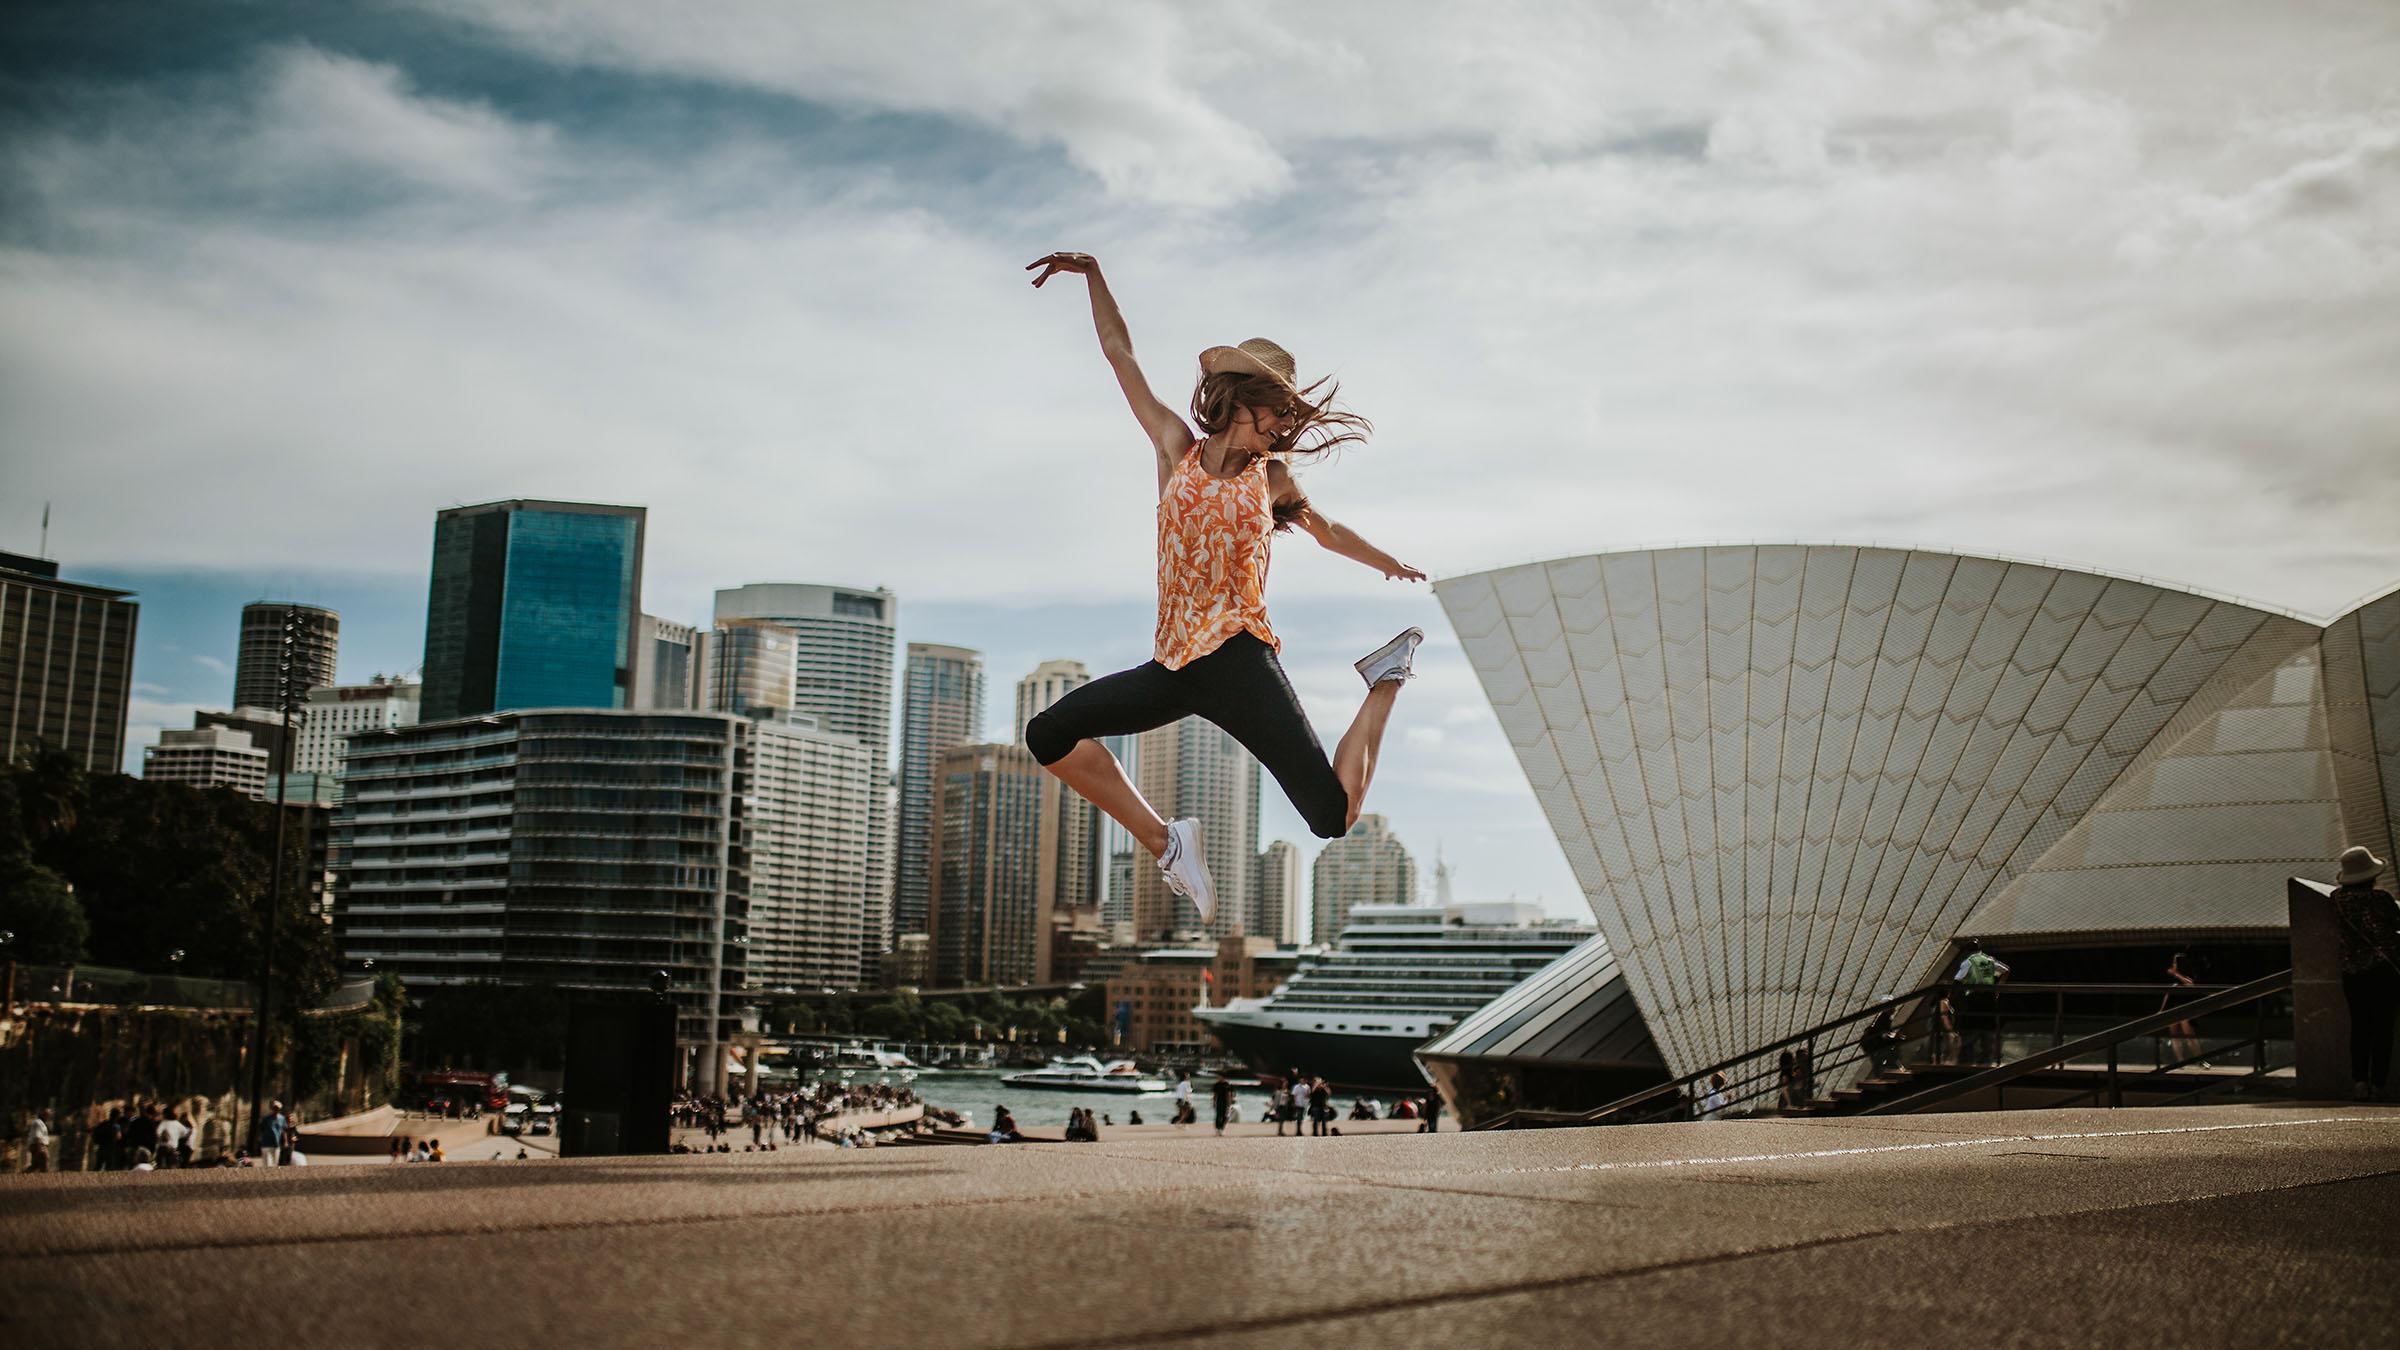 La forma de vida larrikin en las ciudades de Australia